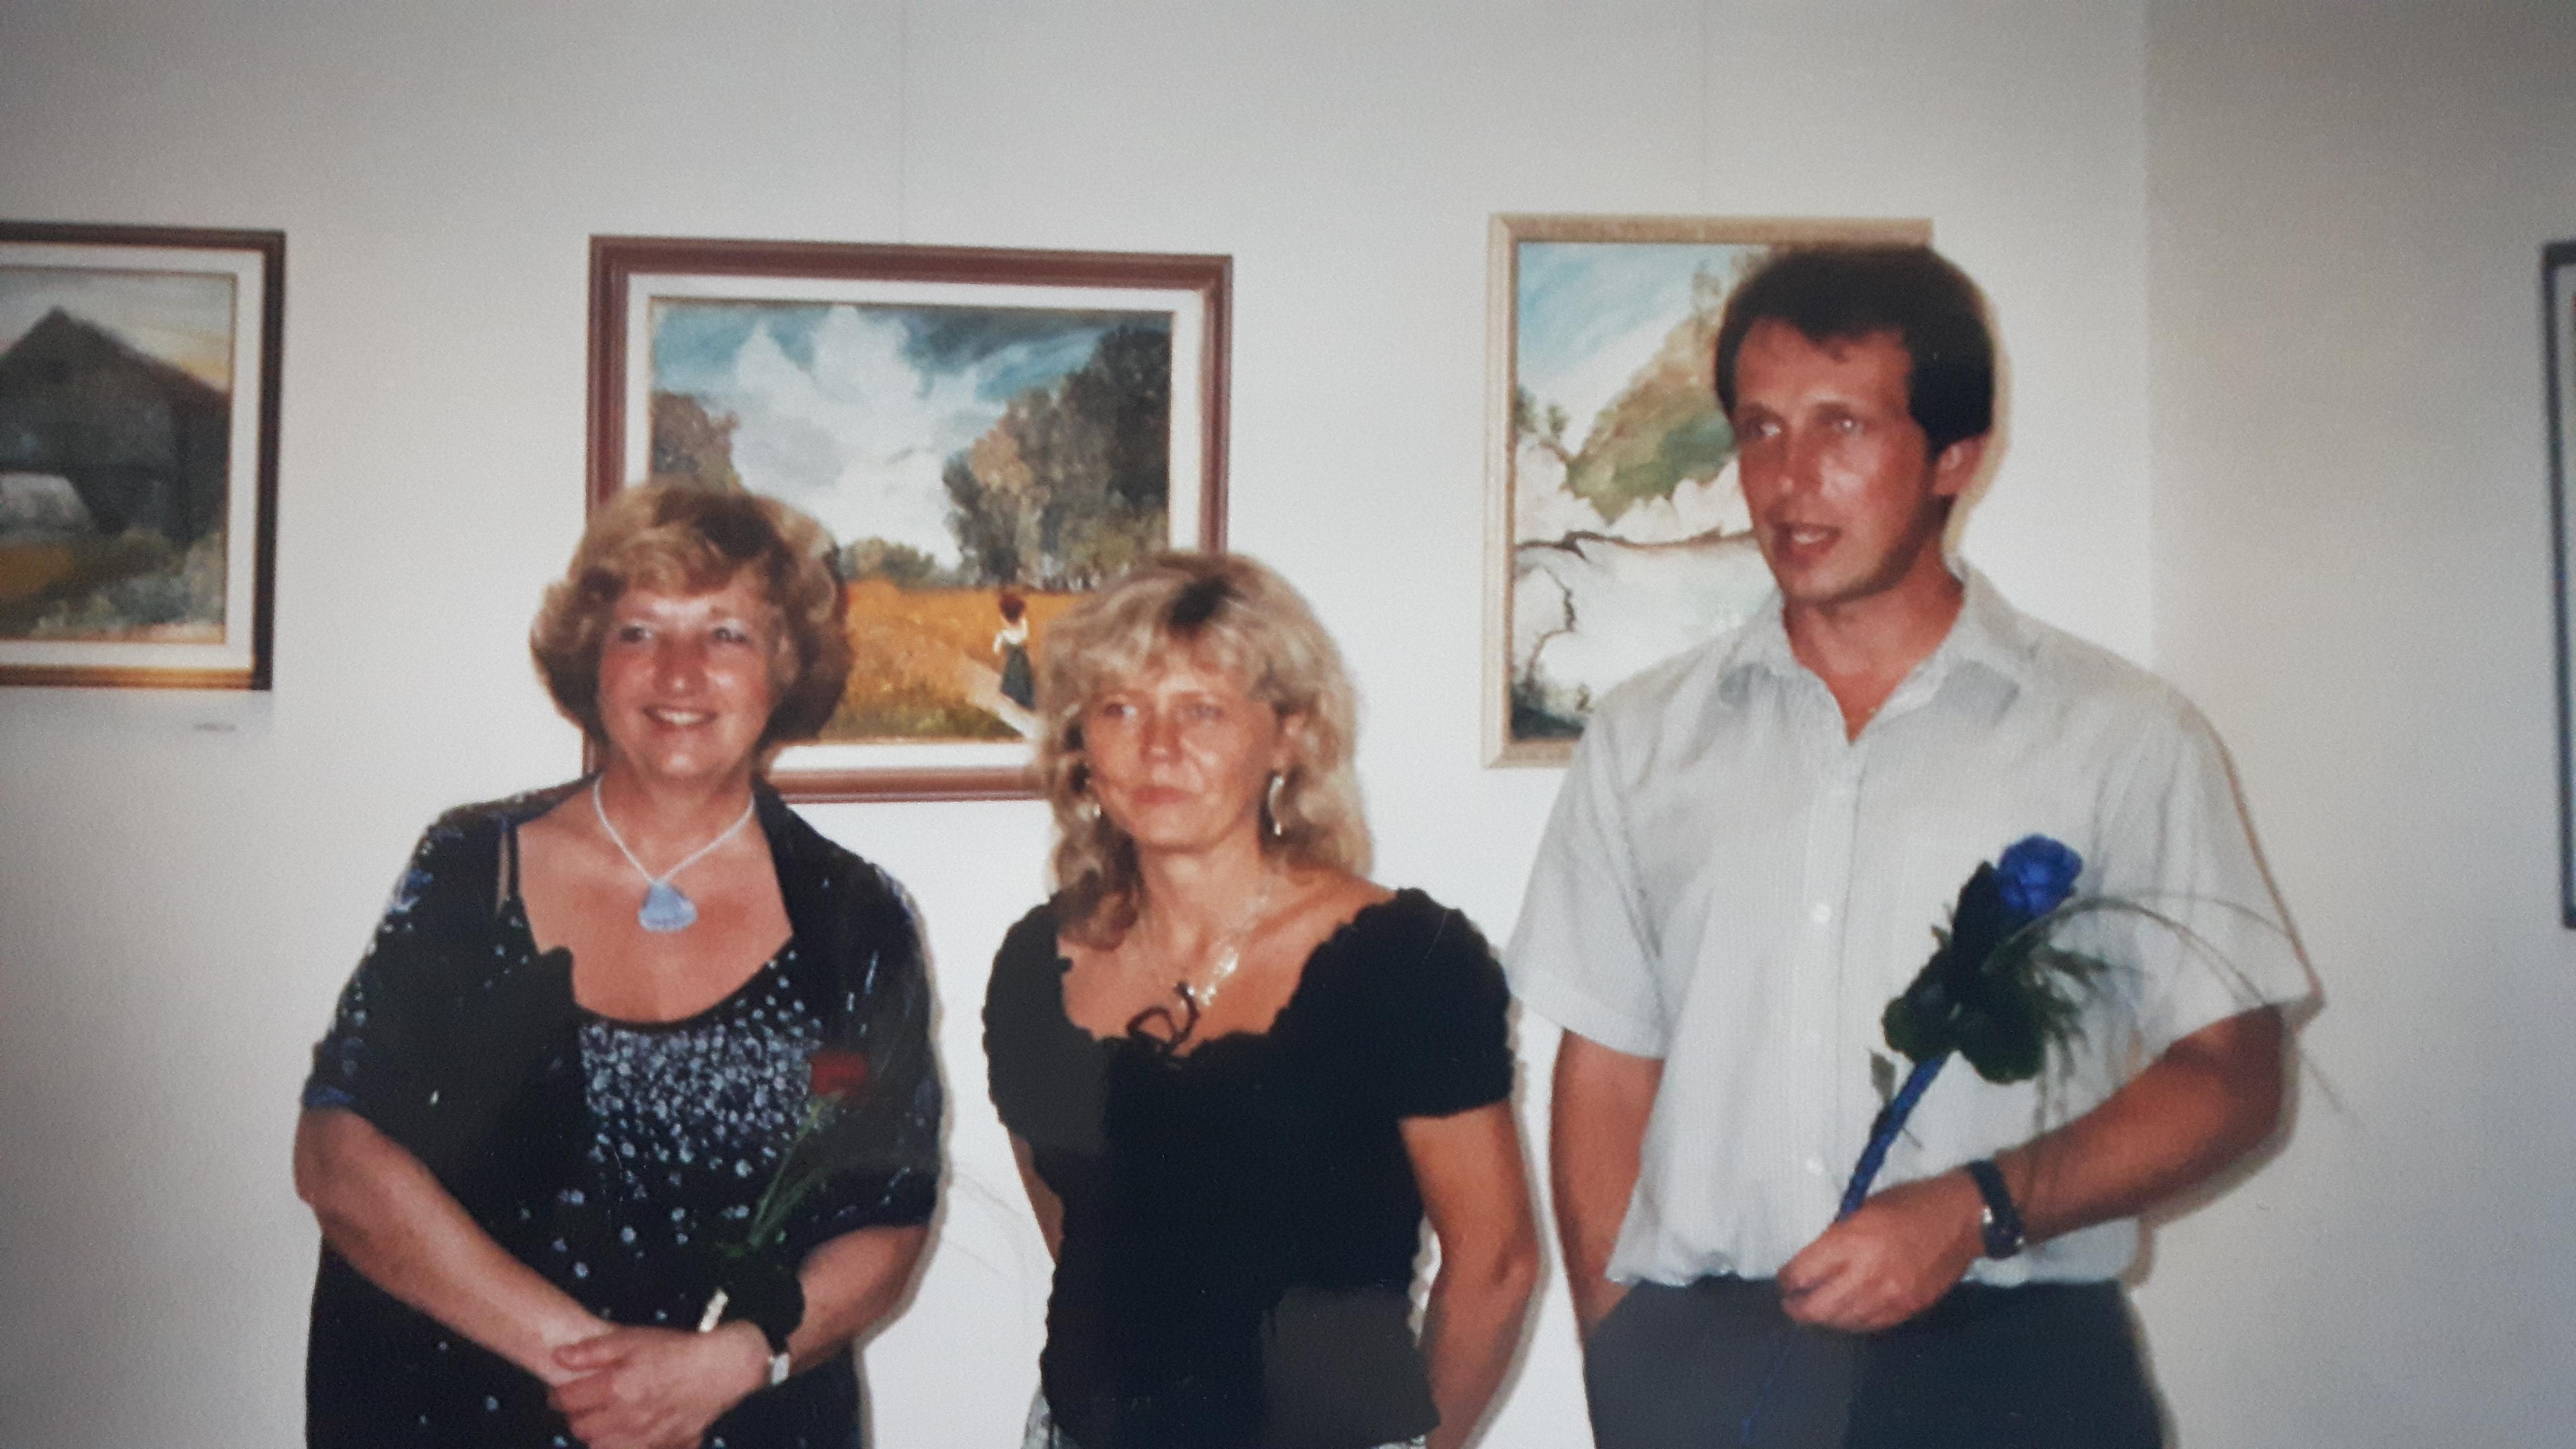 Razstava_trojčka_v_Šoštanju_2004_2